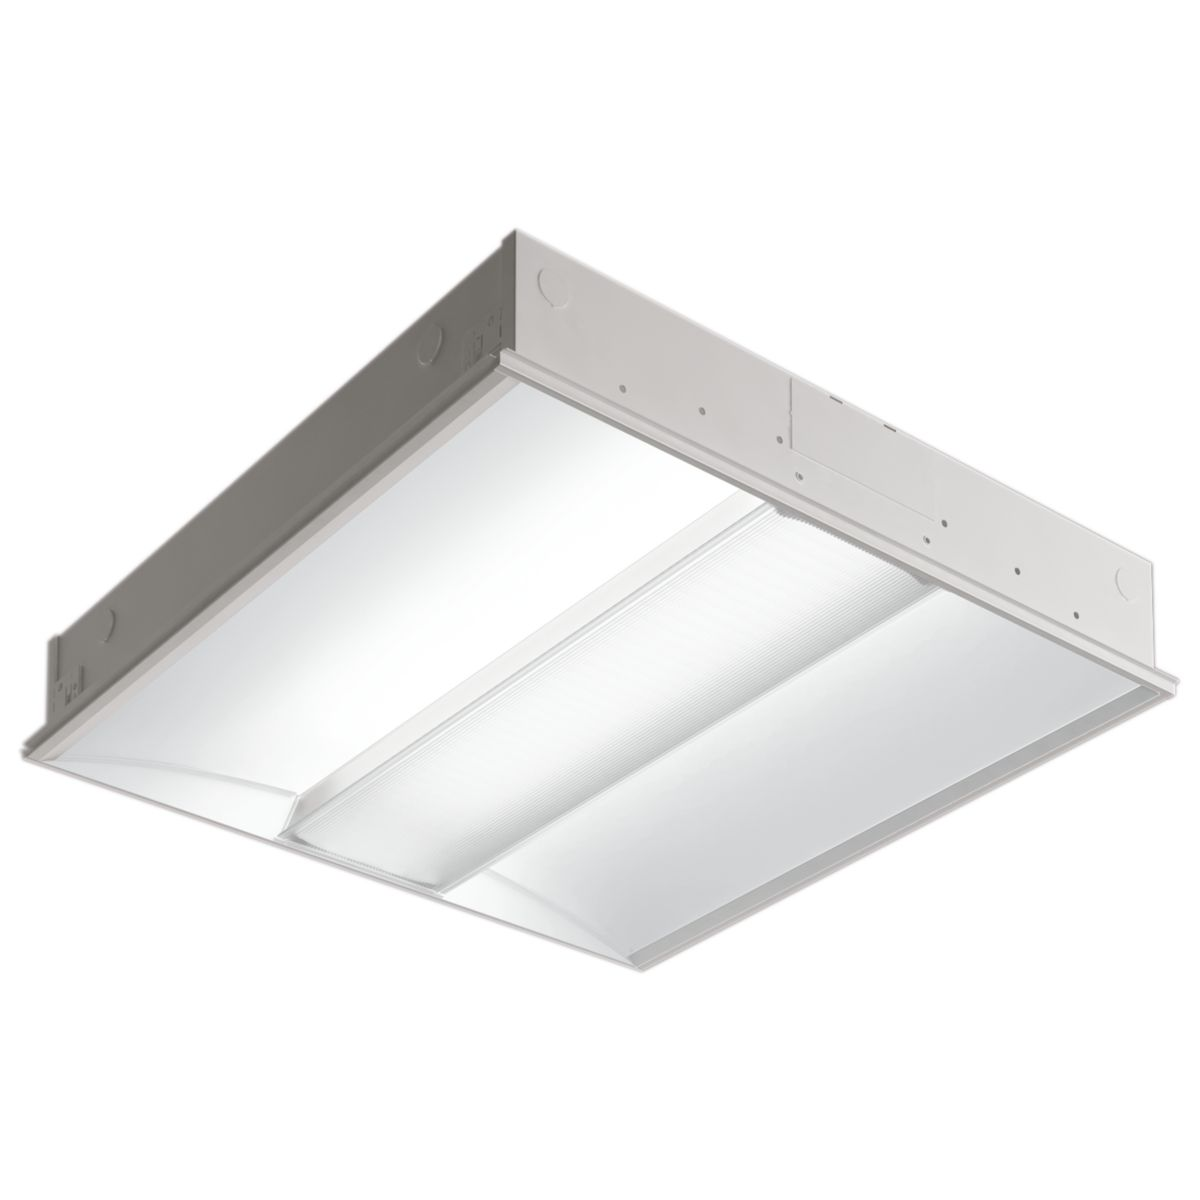 Class R3/Z3 LED